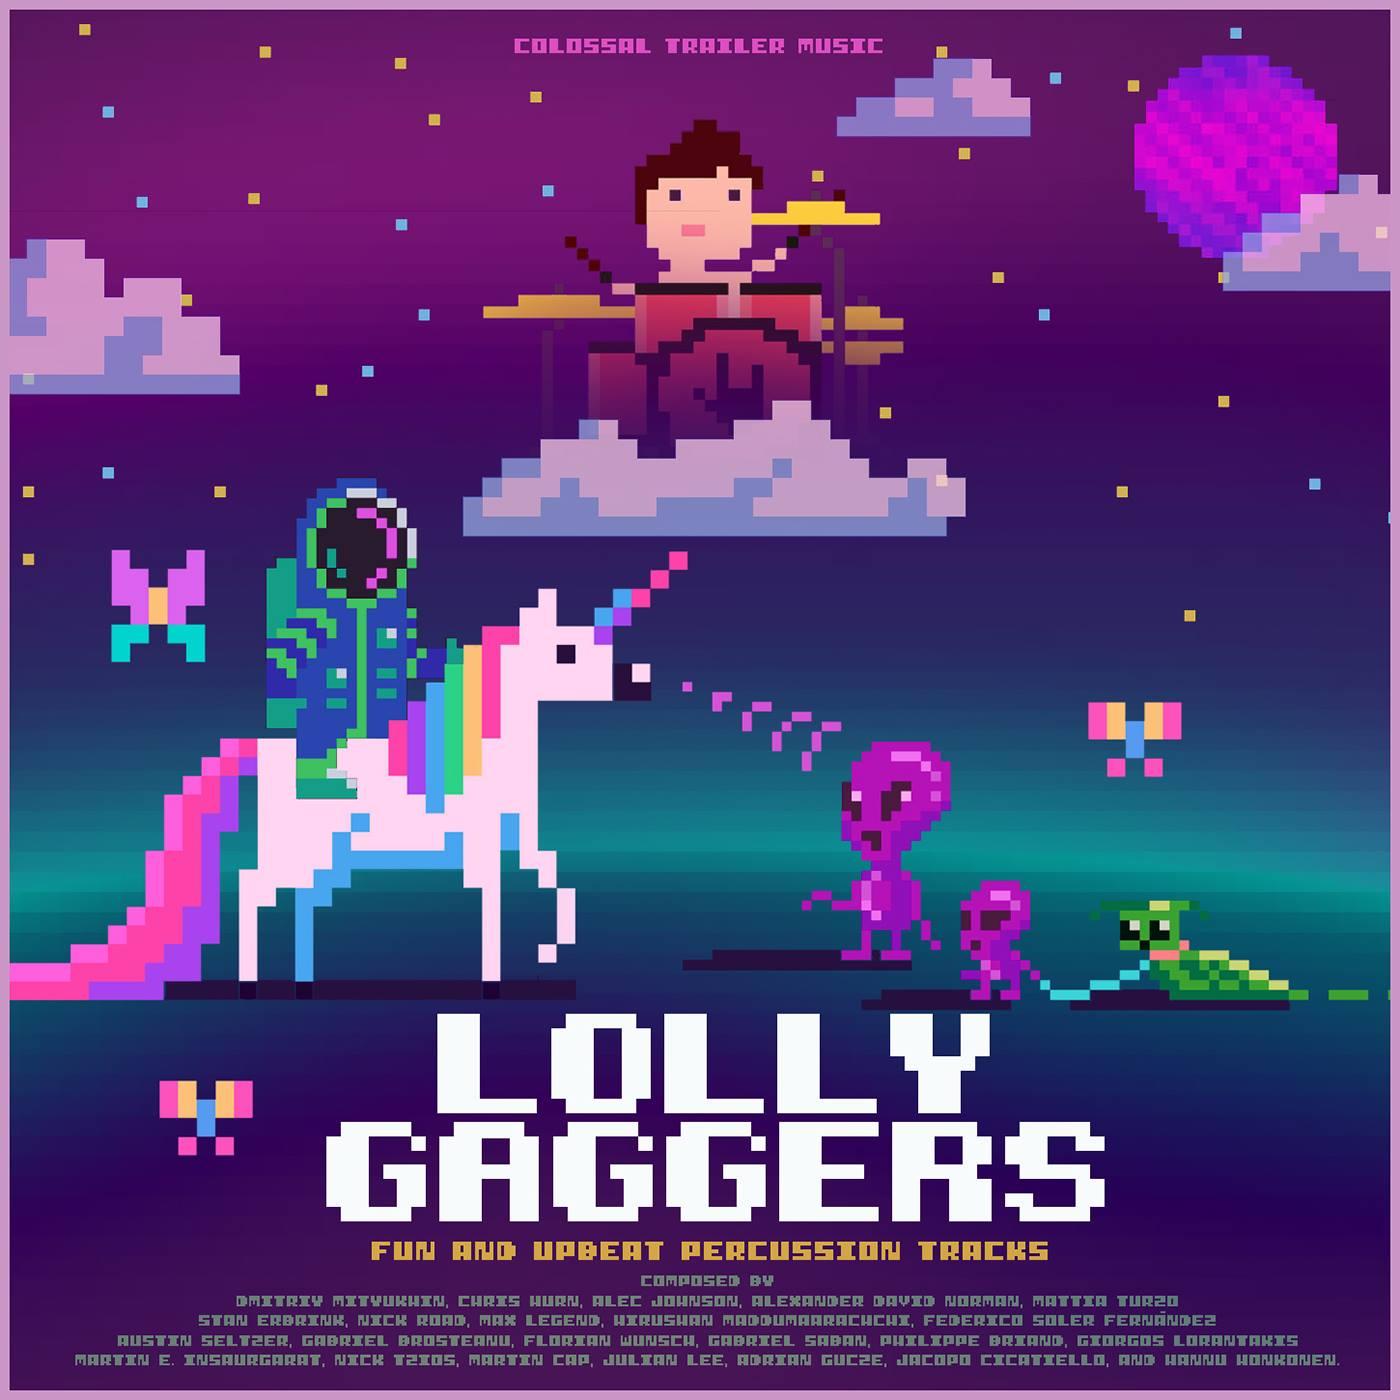 Lollygaggers